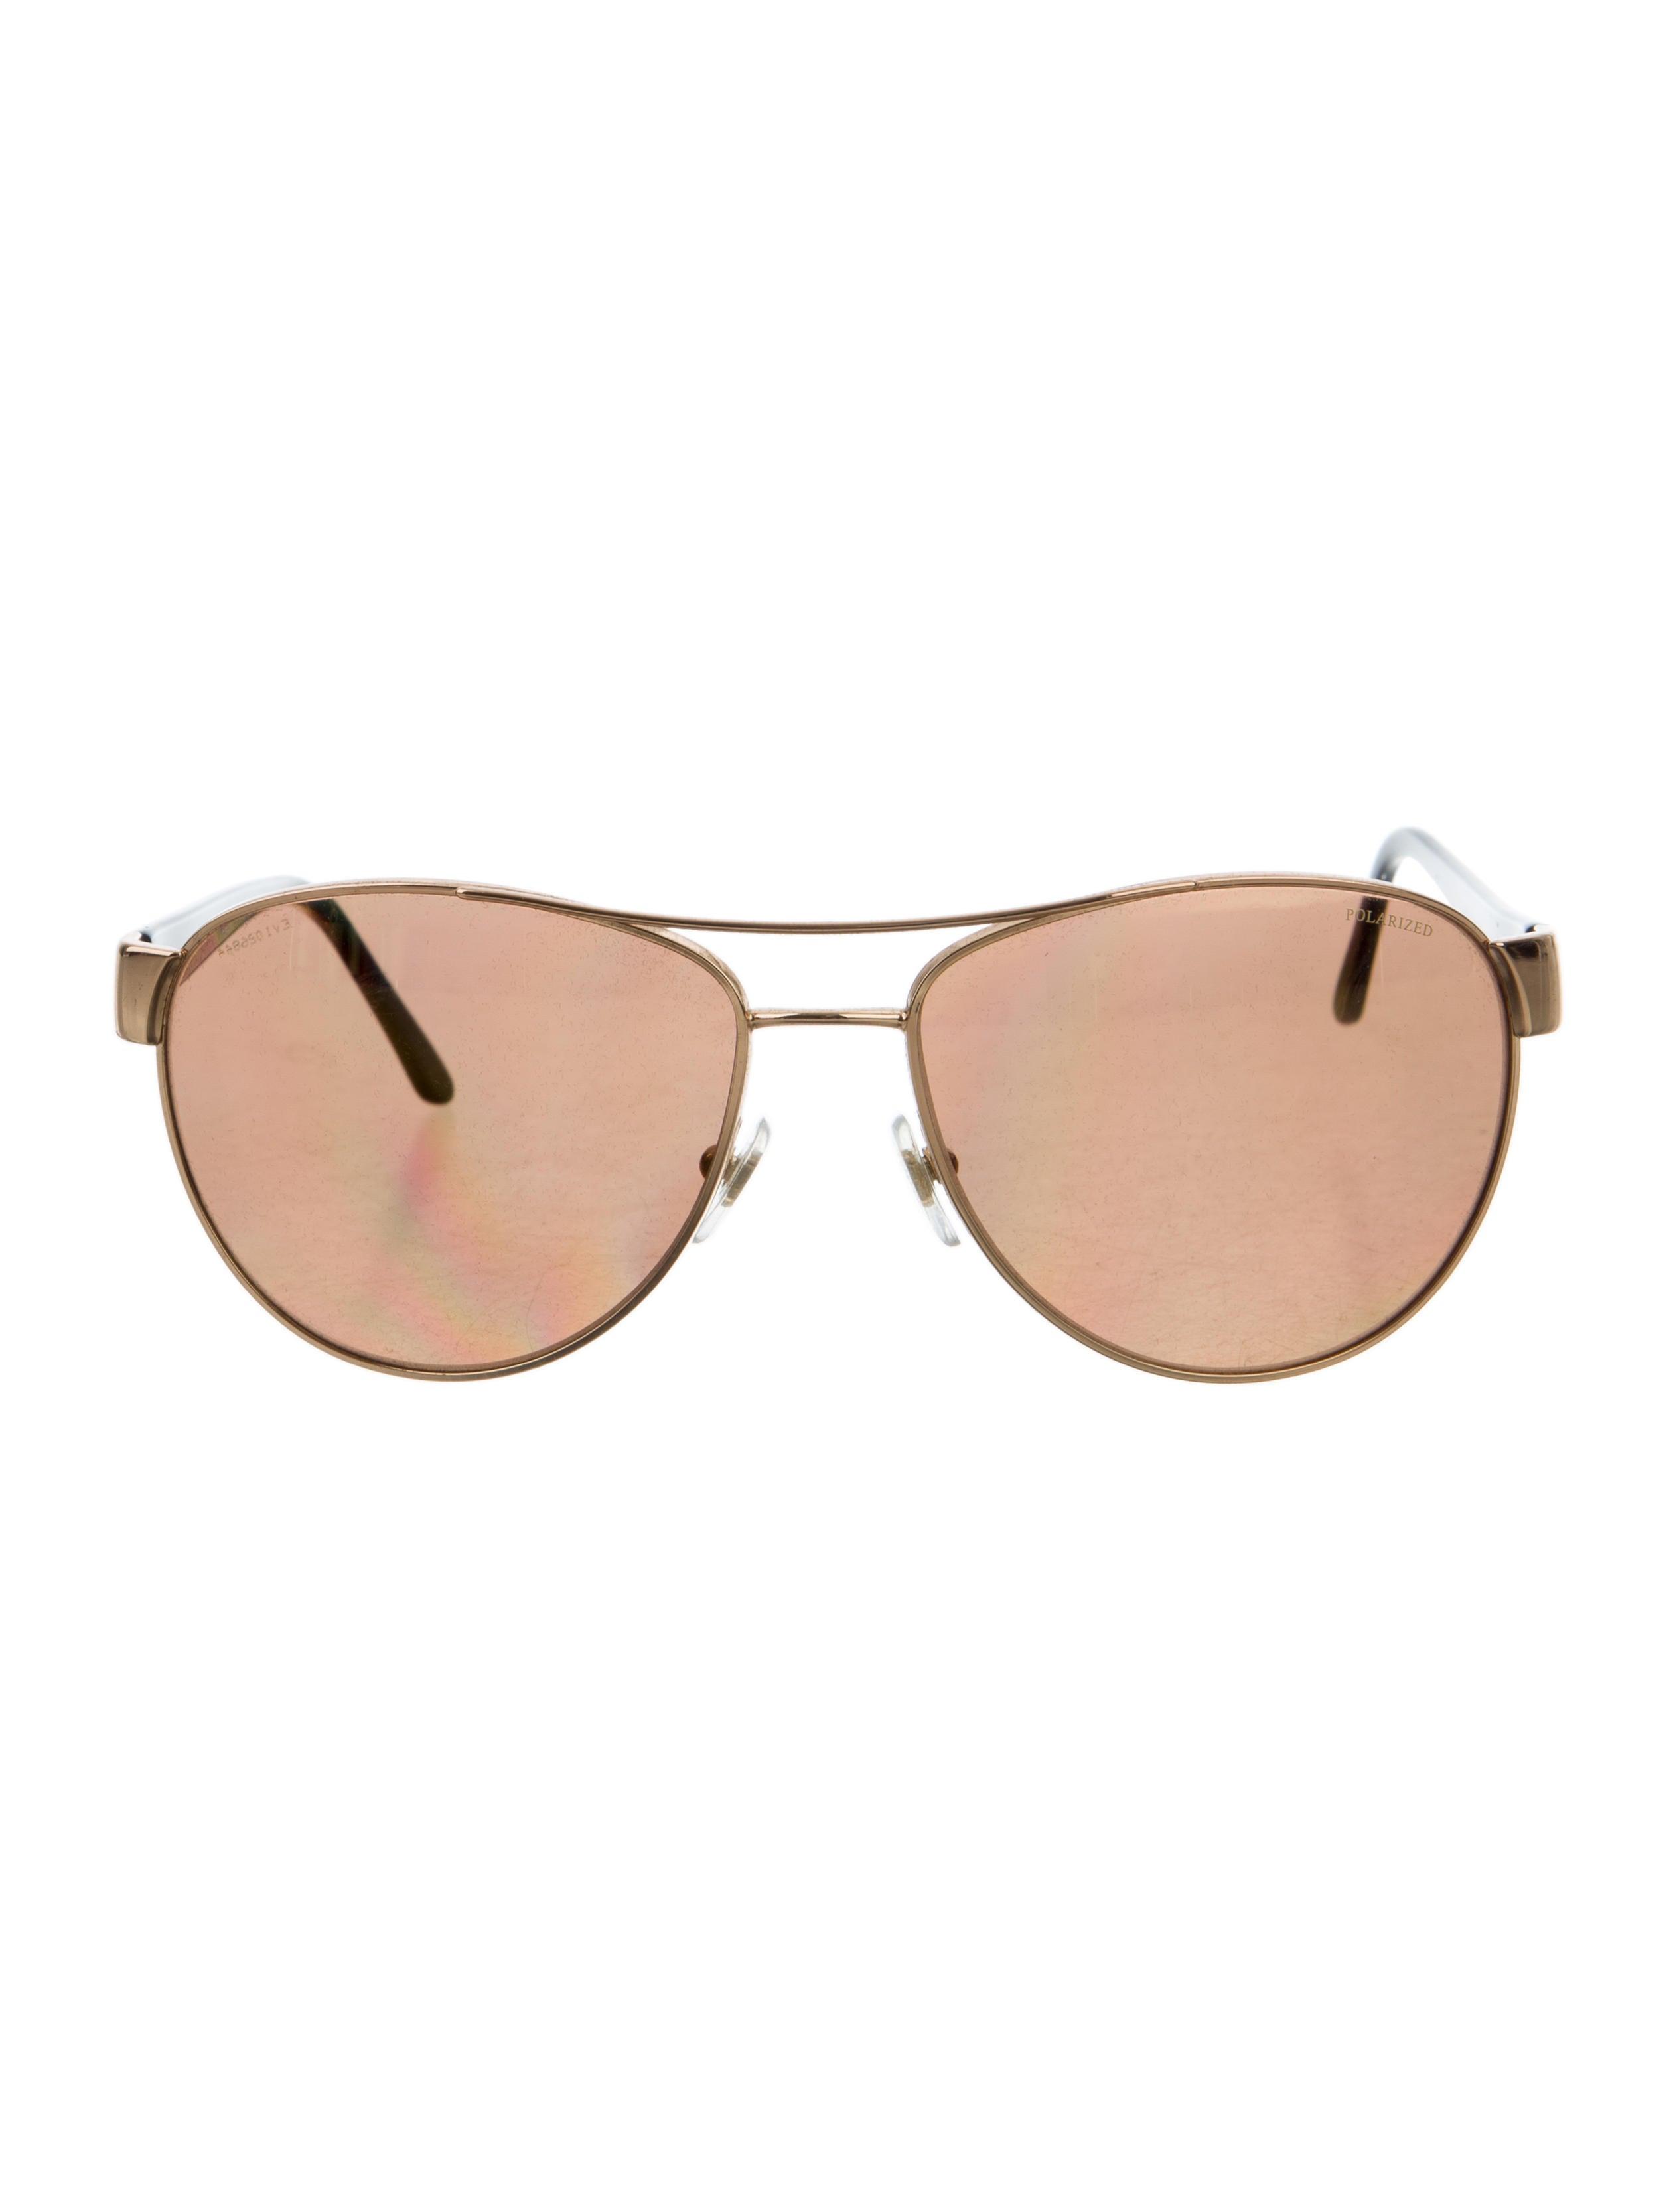 1e1a46ed45 Versace Ve 4179 Sunglasses Polarized